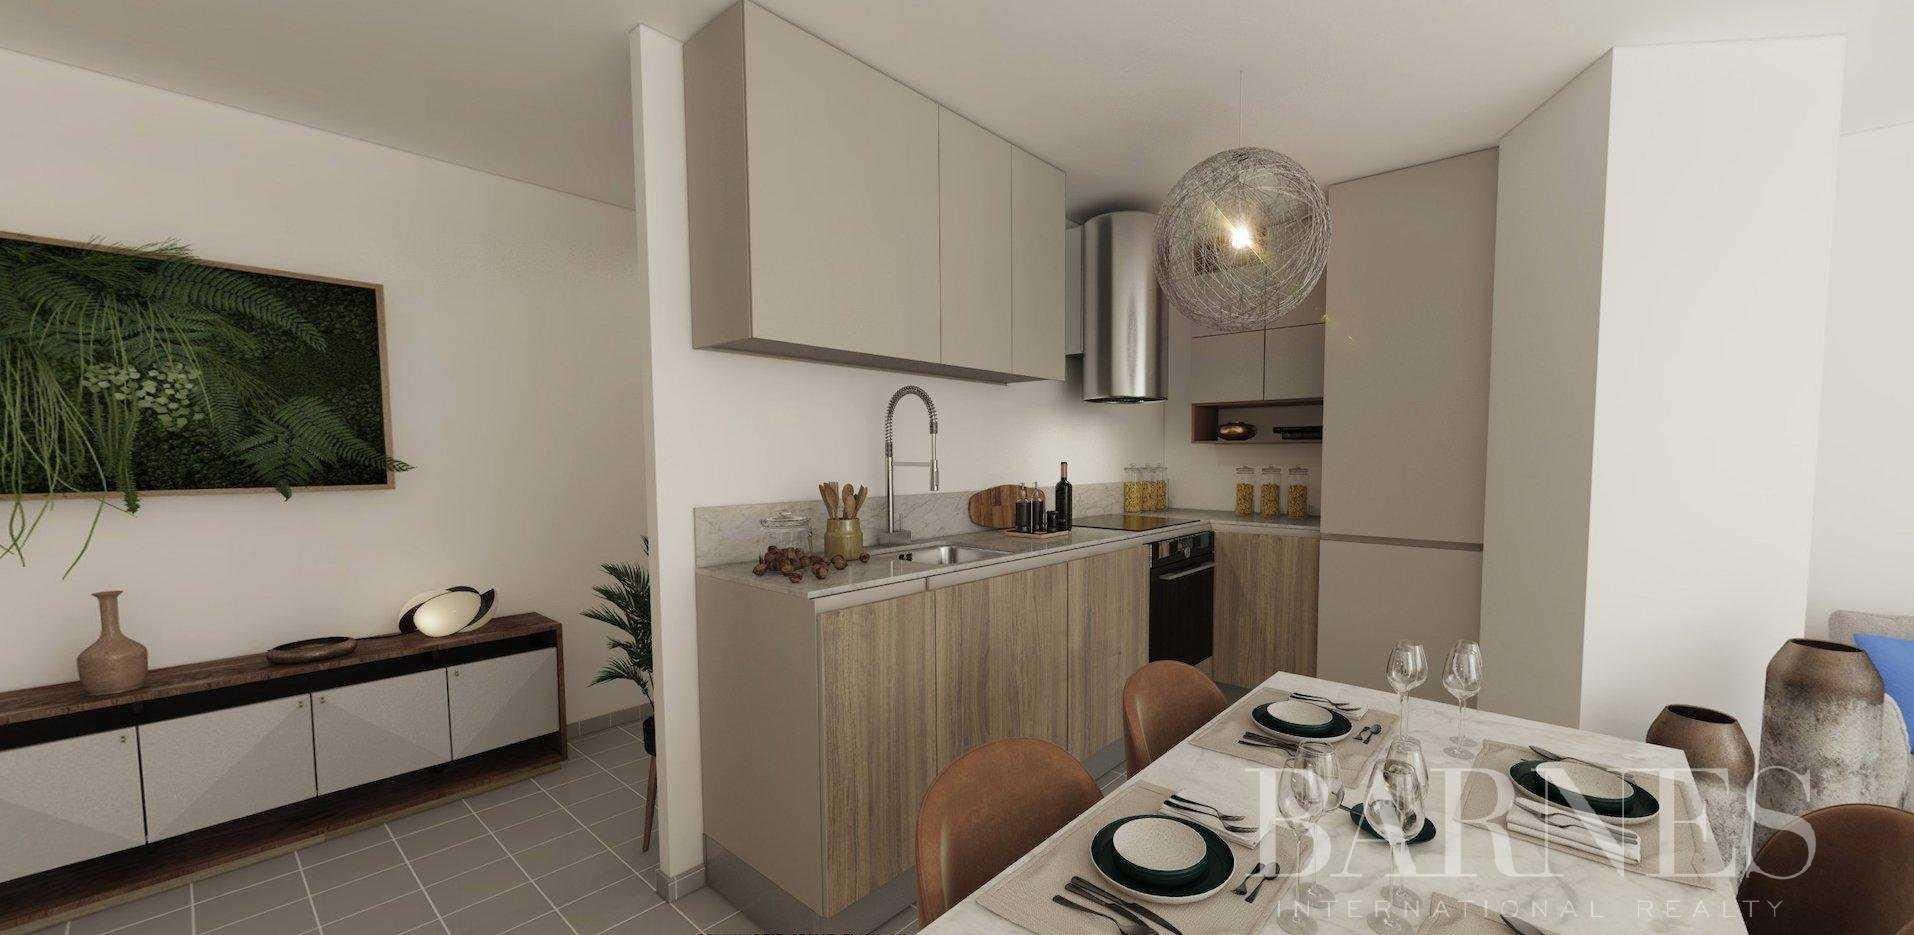 Appartement Grasse  -  ref 4518603 (picture 1)